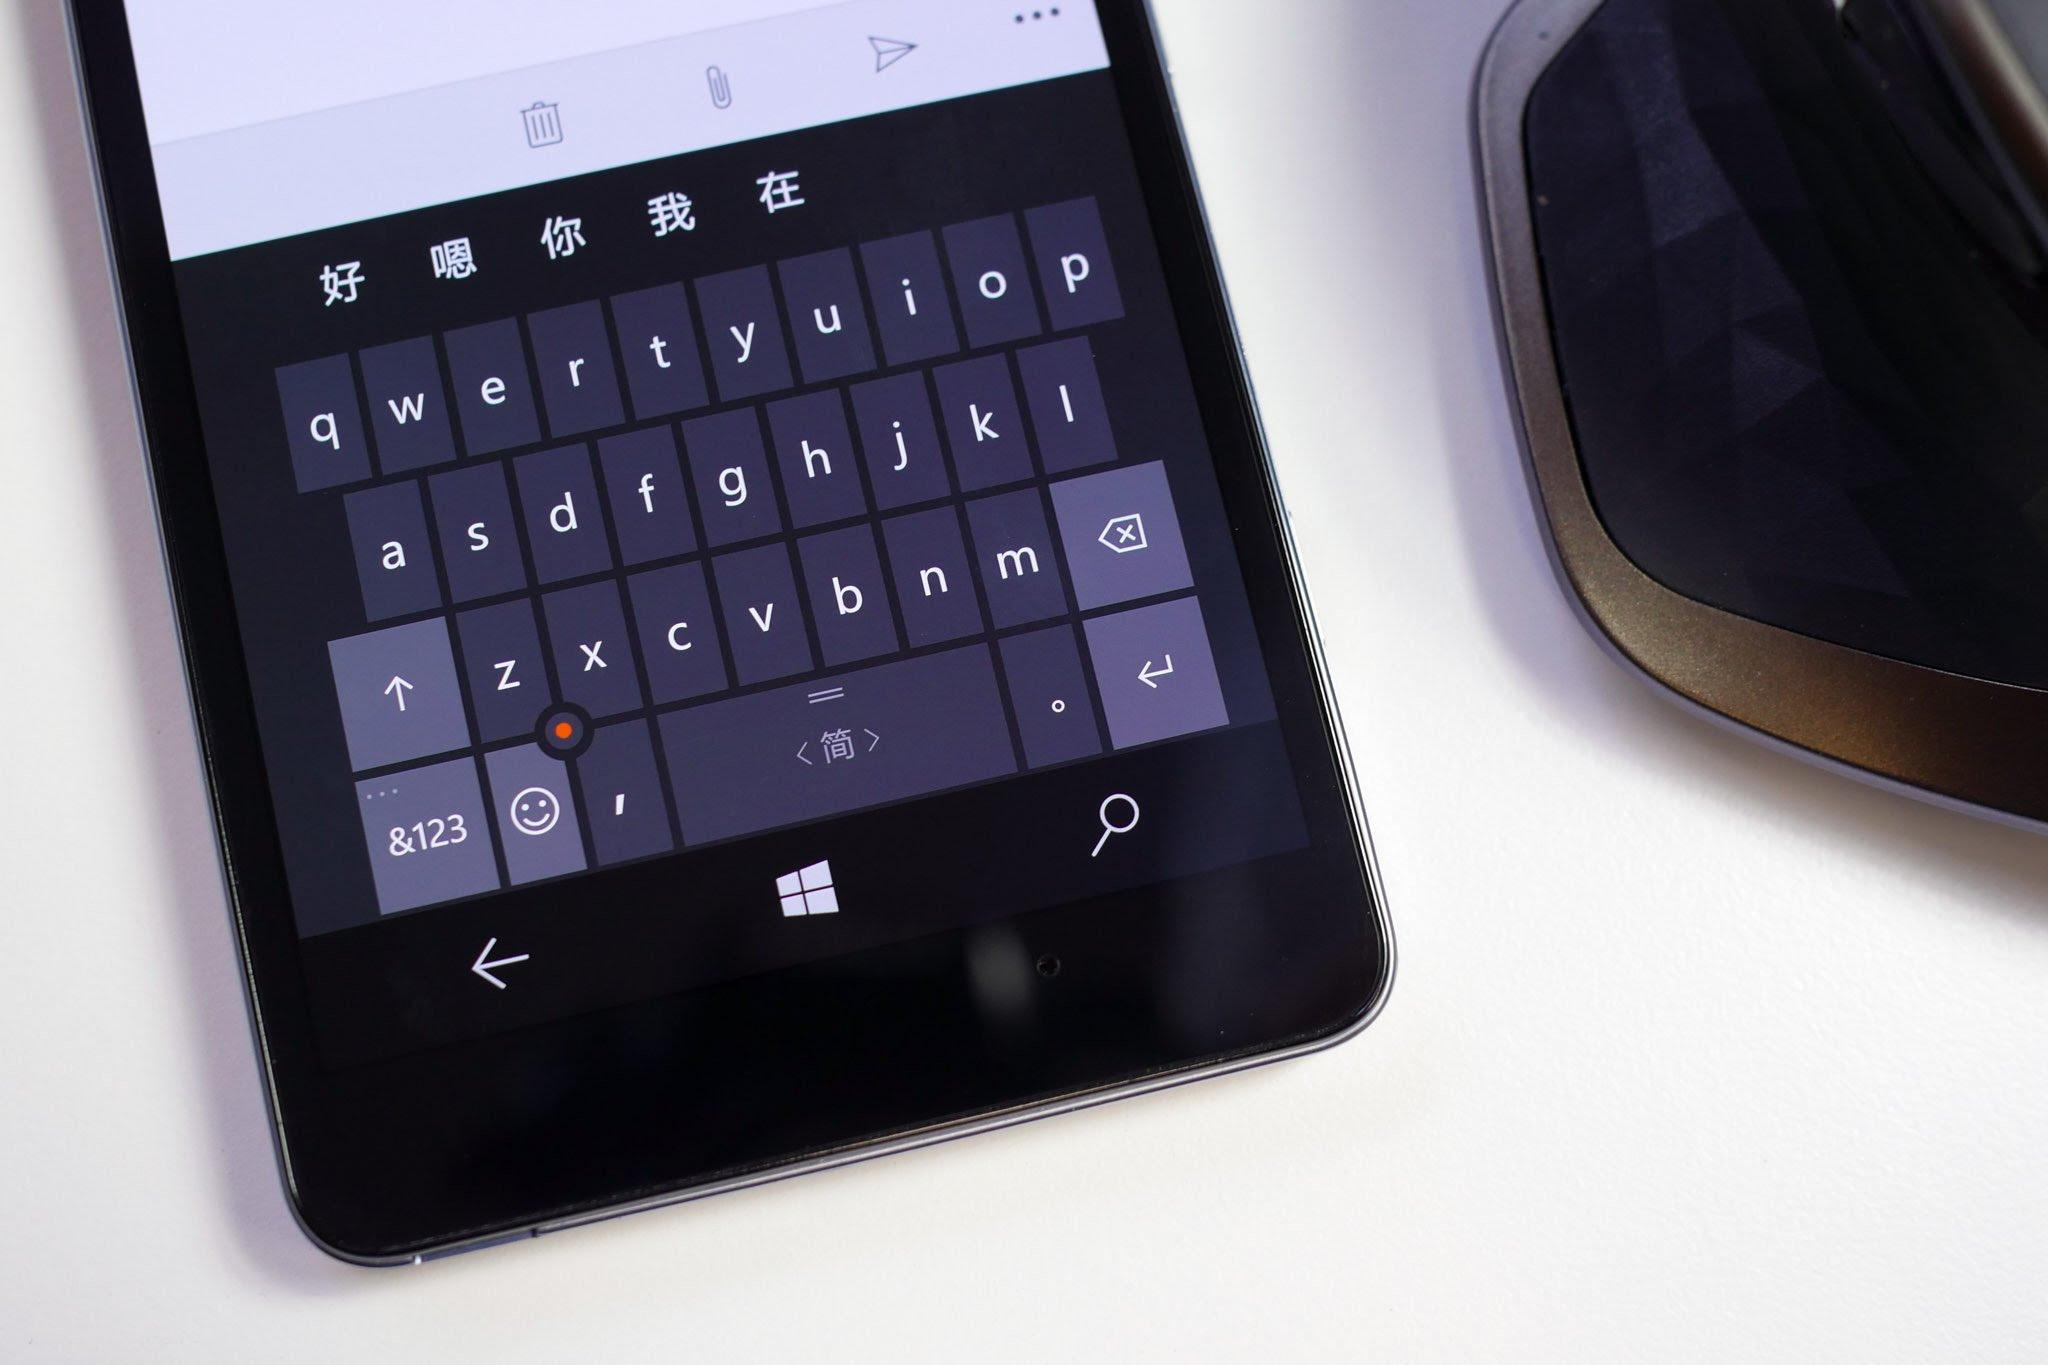 Lumia 950 keyboard